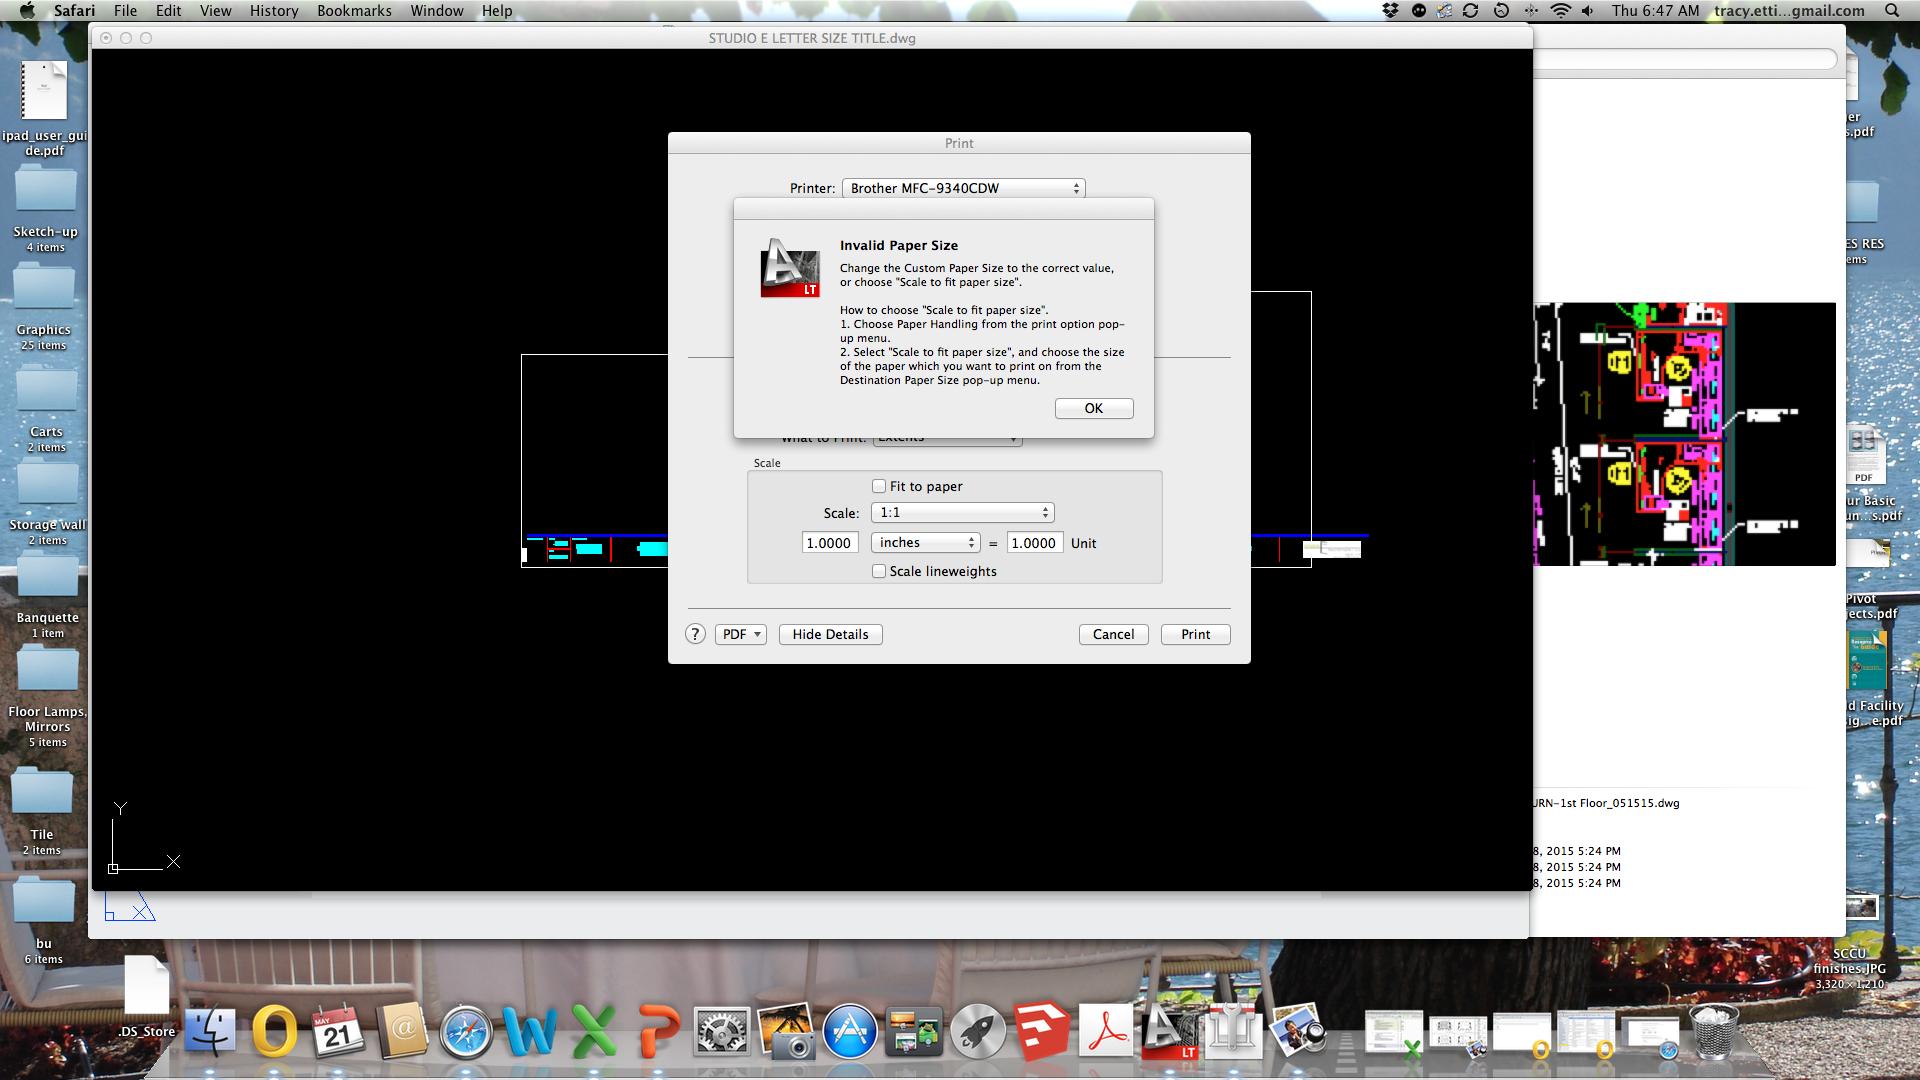 solved setup autocad 2013 lt mac for 30x42 pdf when i only have an rh forums autodesk com Autodesk Maya 2013 Autodesk Navisworks